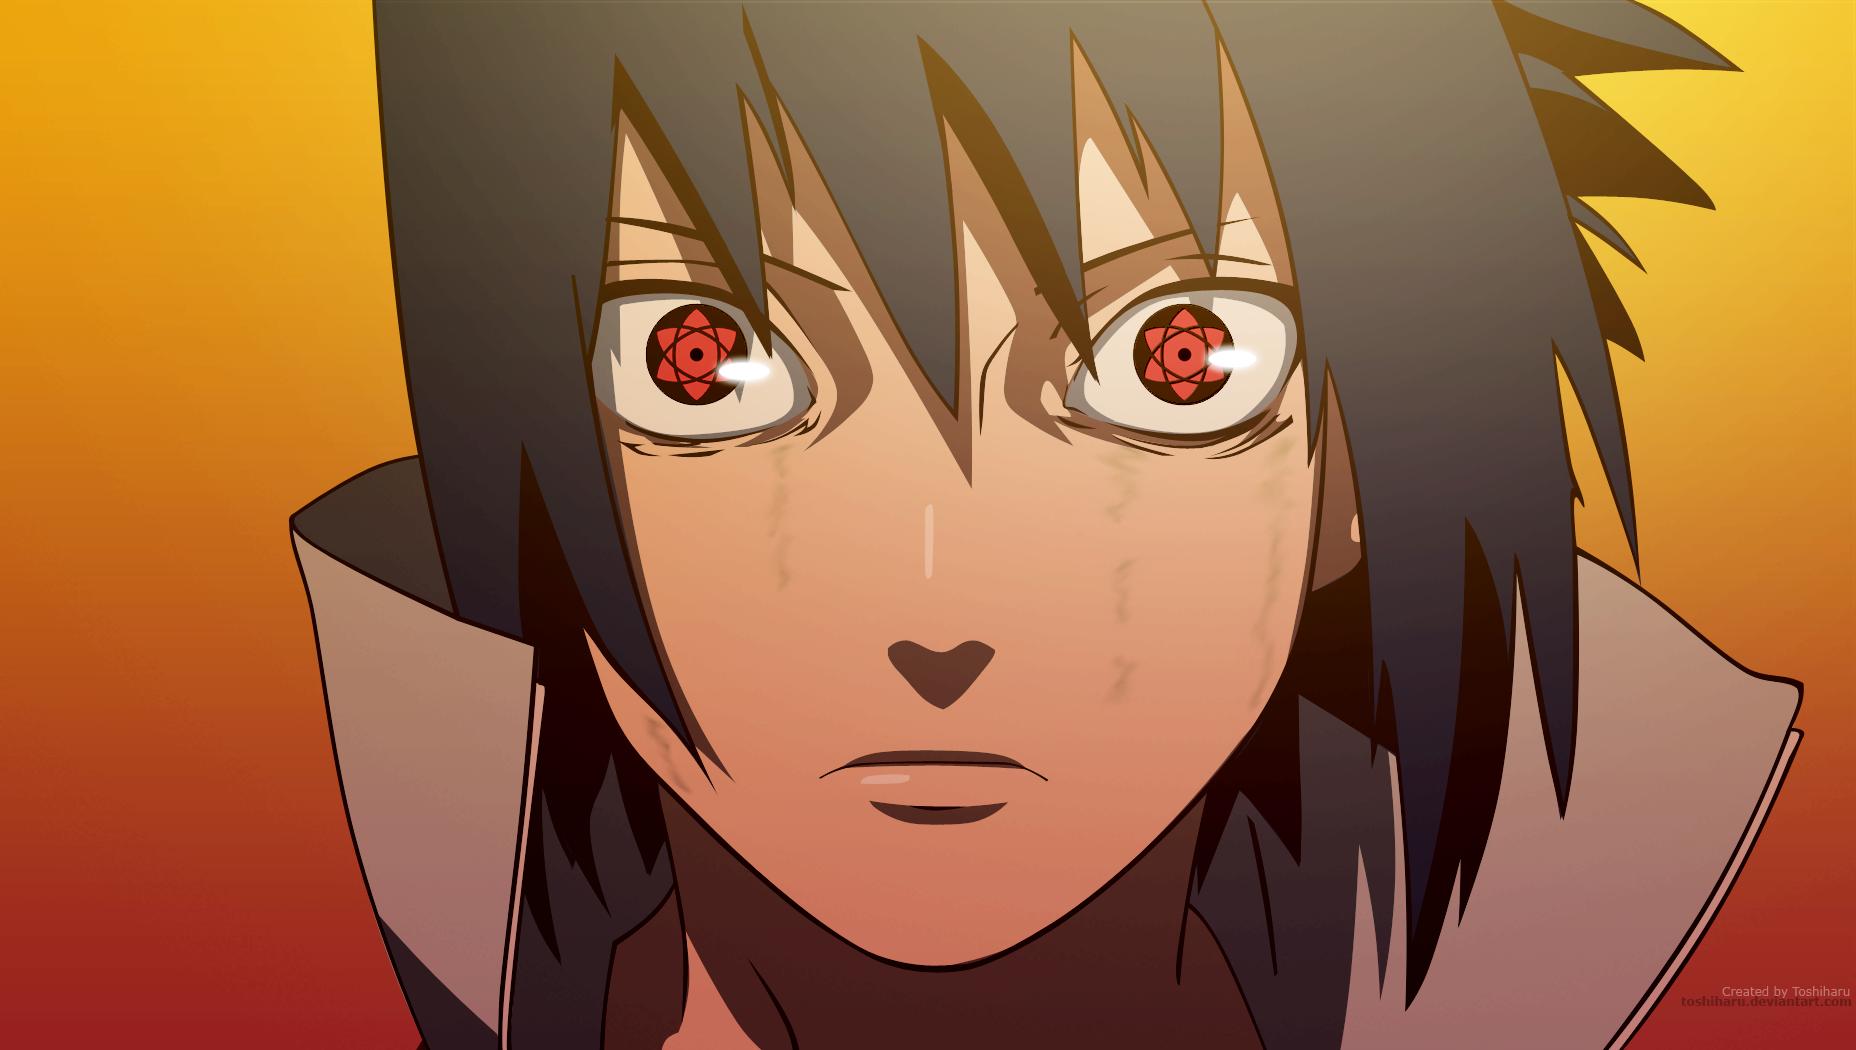 SASUKE MANGEKYOU SHARINGAN | Naruto | Pinterest | Sasuke ...